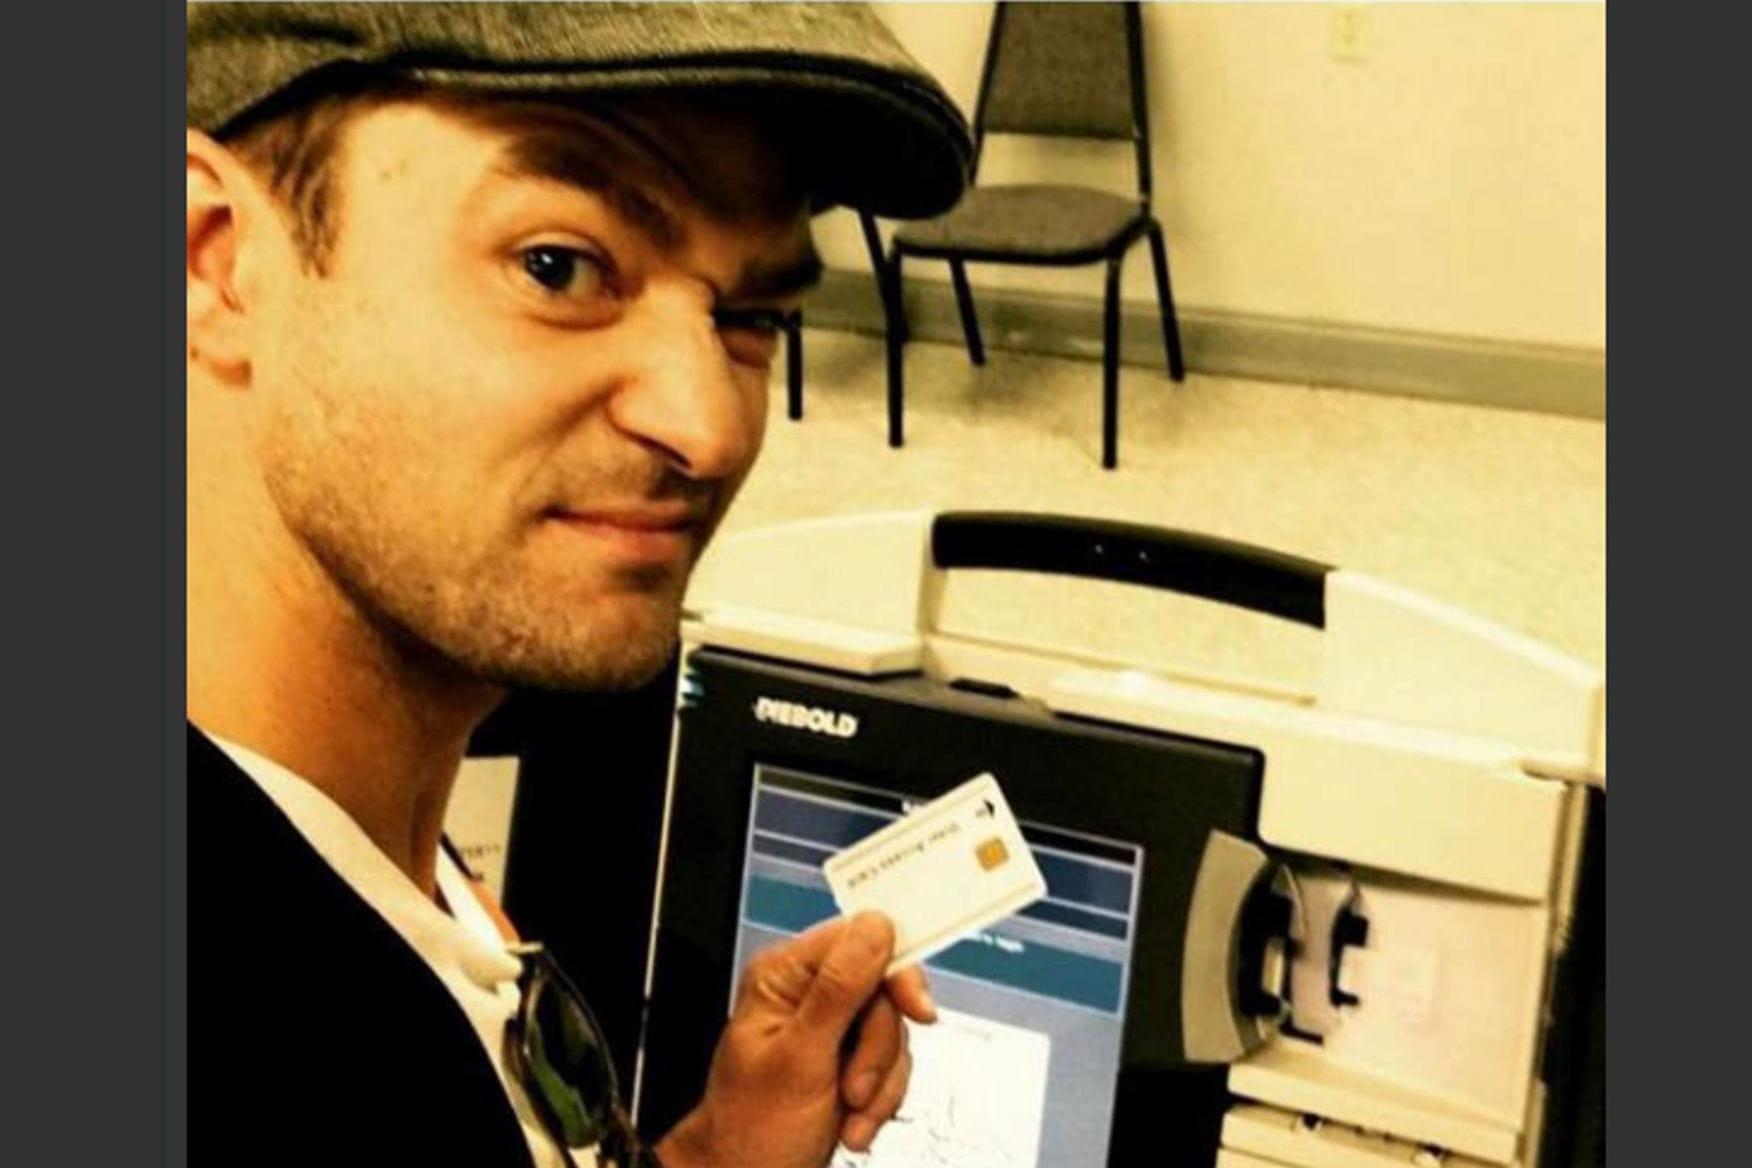 Justin Timberlake risque la prison pour un selfie !